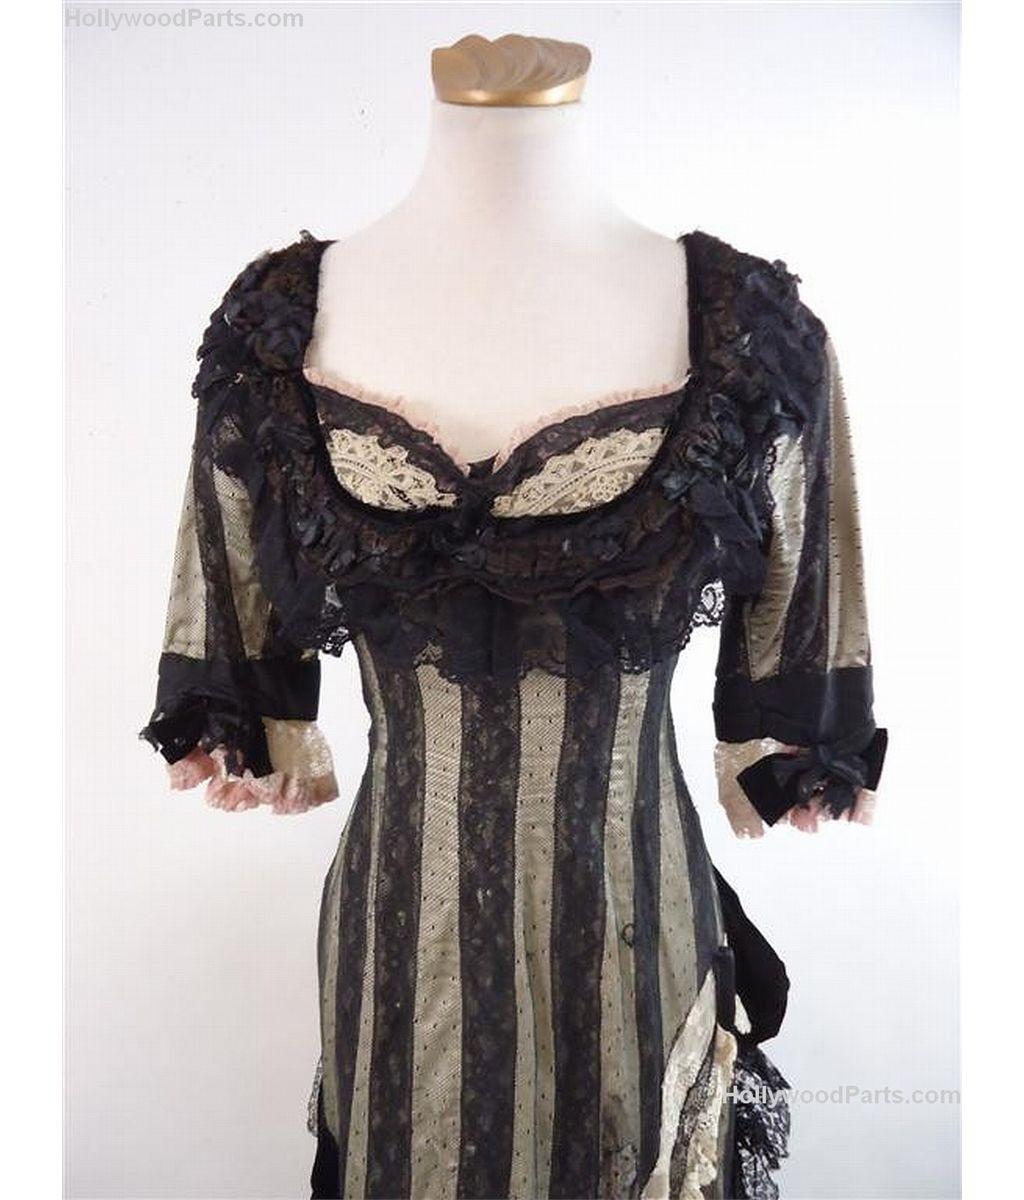 Angelina Jolie Original Sin original sin julia (angelina jolie) black dress and corset